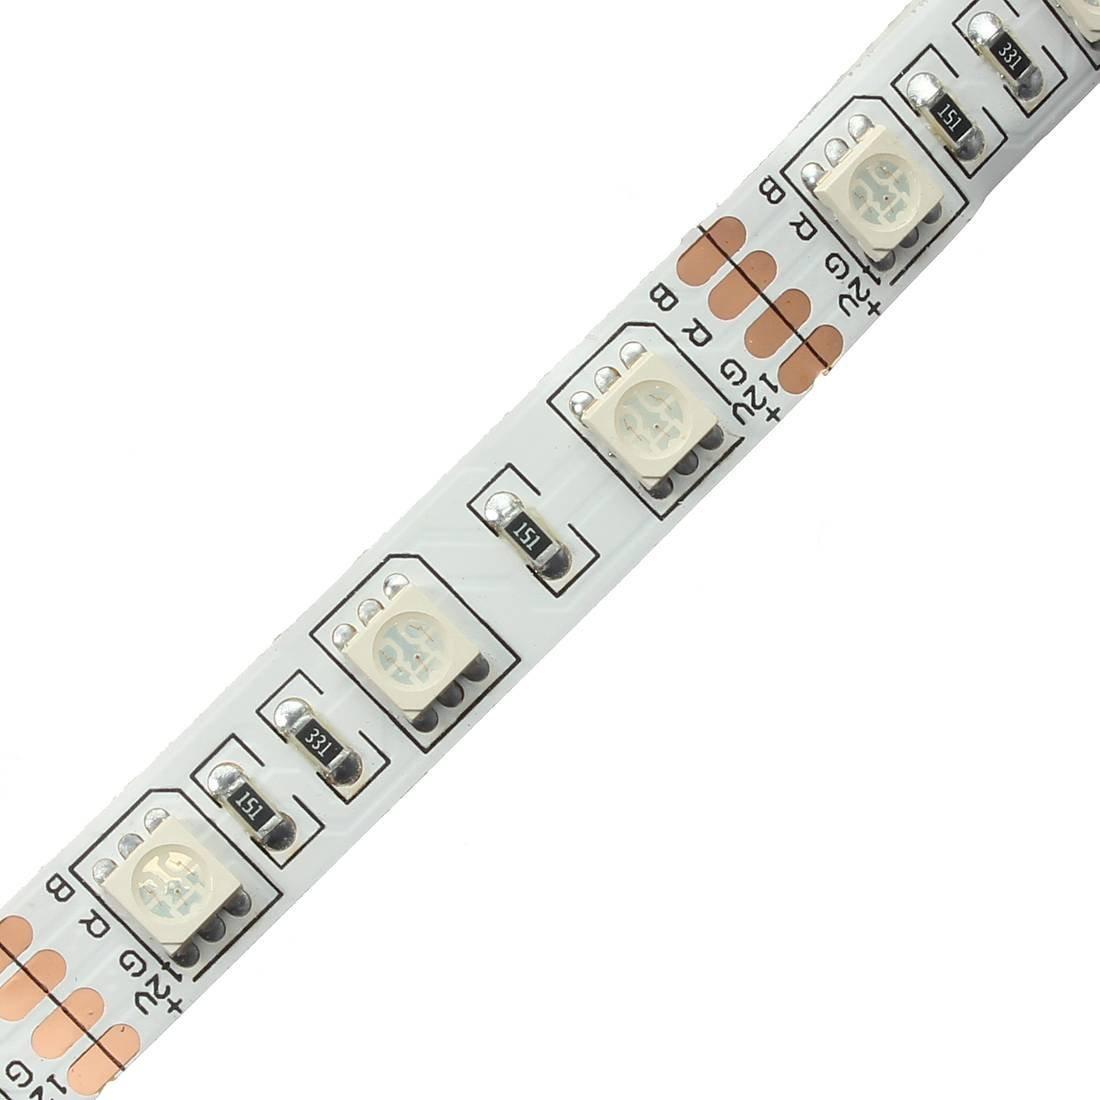 5M RGB 300 5050 LED Flexible Light Strip Non-waterproof DC12V D3C4 | eBay